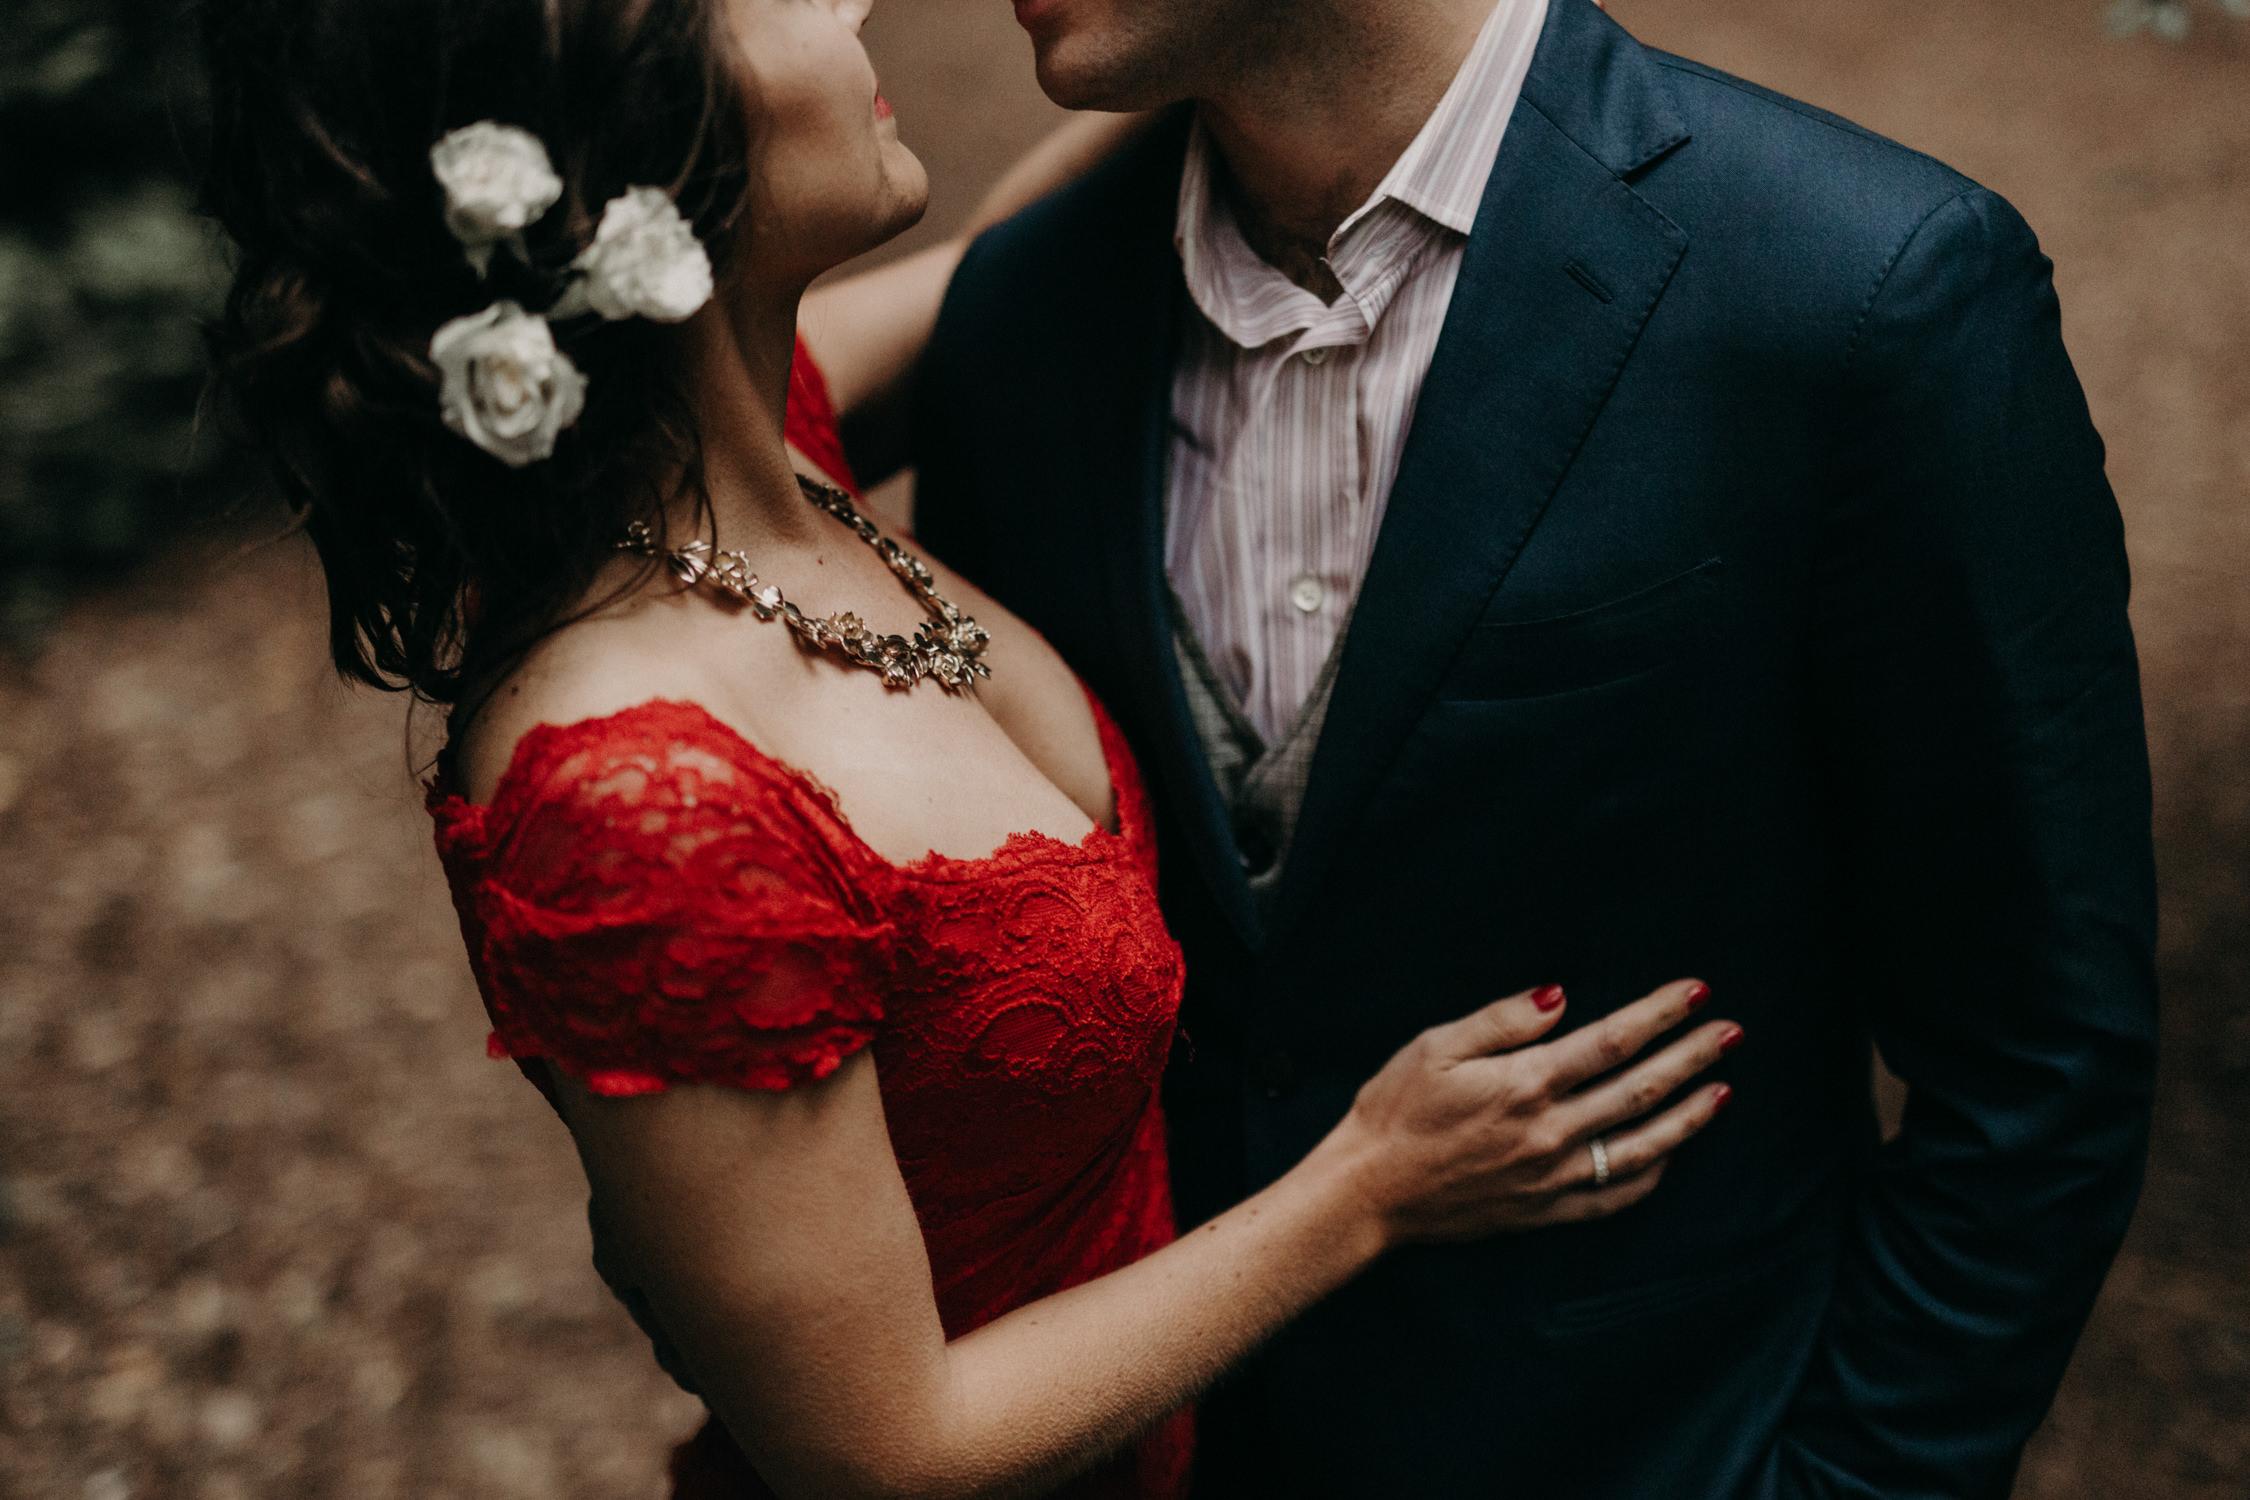 couple-intimate-engagement-session-mt-tam-66.jpg